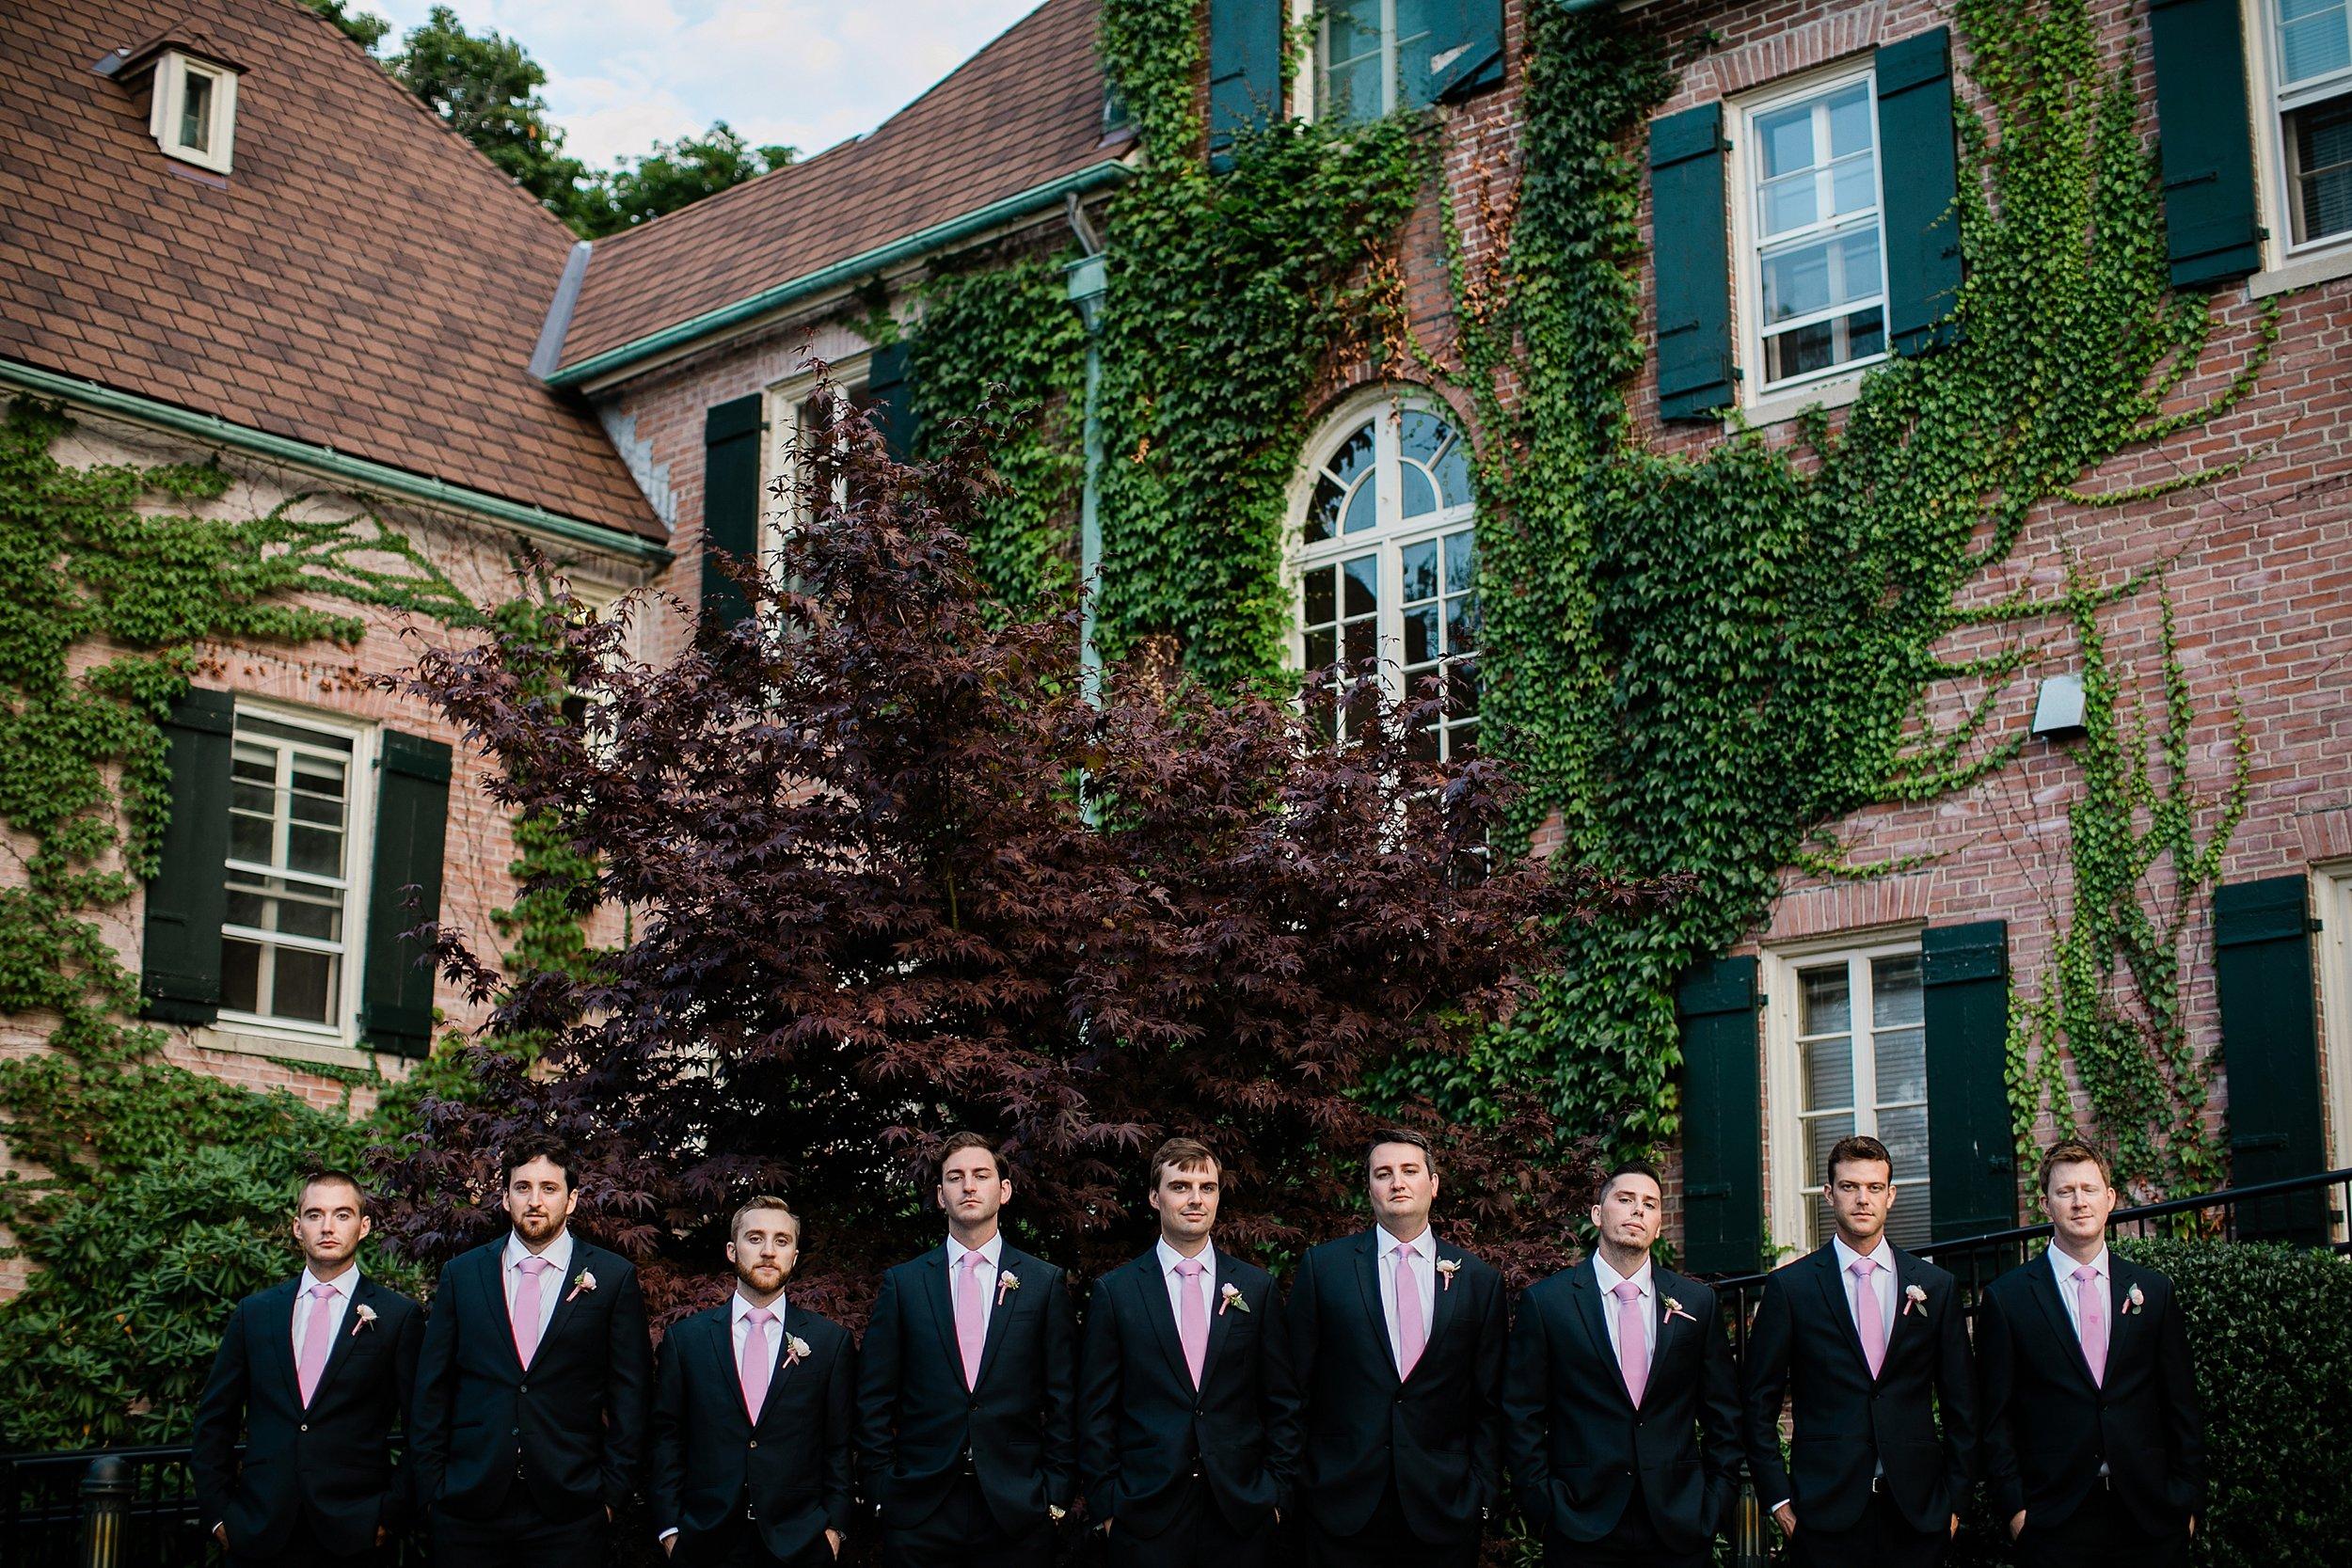 021 los angeles wedding photographer todd danforth photography boston.jpg